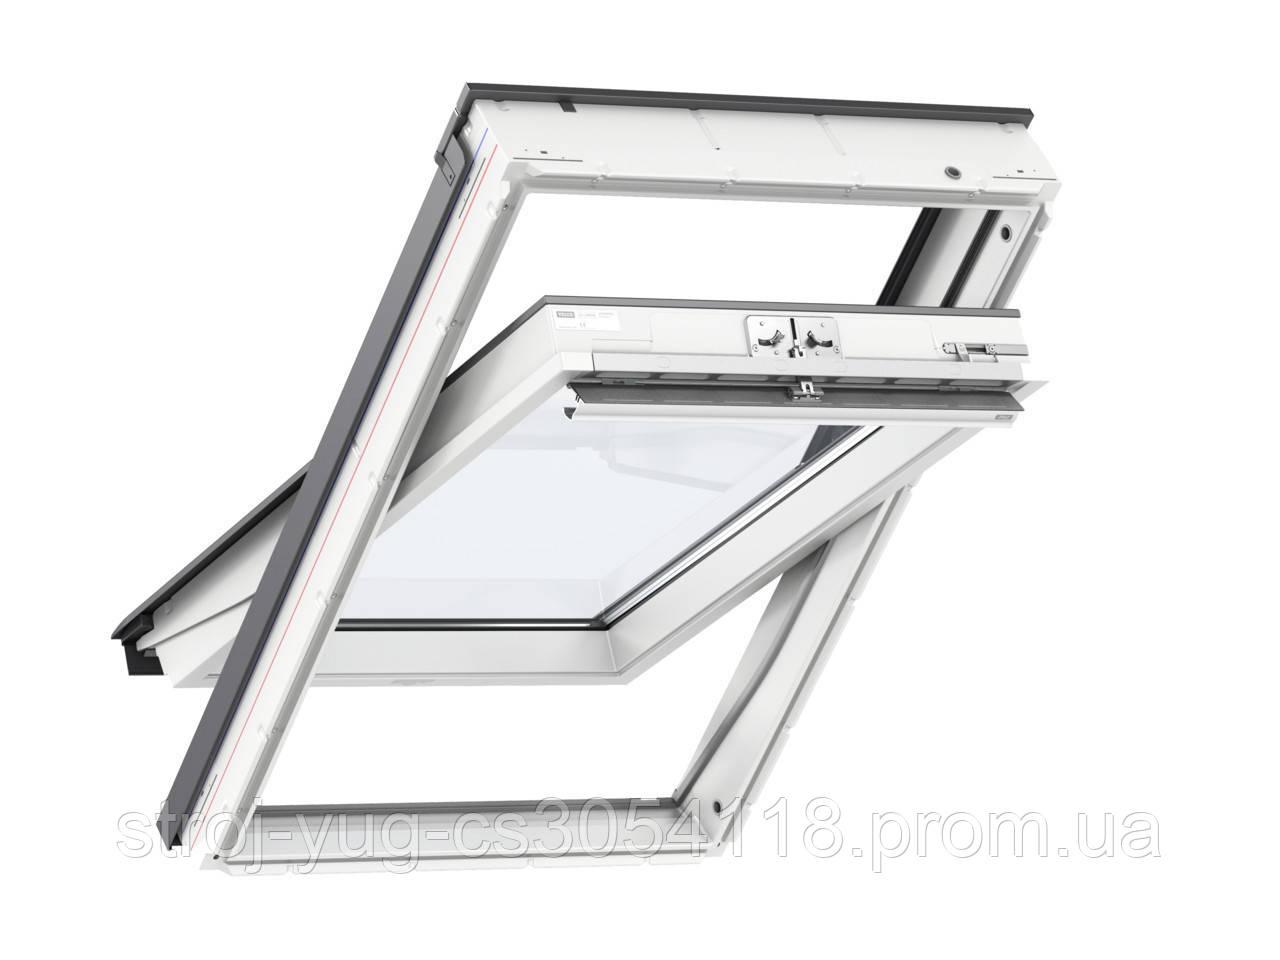 Мансардное влагостойкое окно VELUX Стандарт GLU 0051, ручка сверху, дерево/полиуретан, 66х118